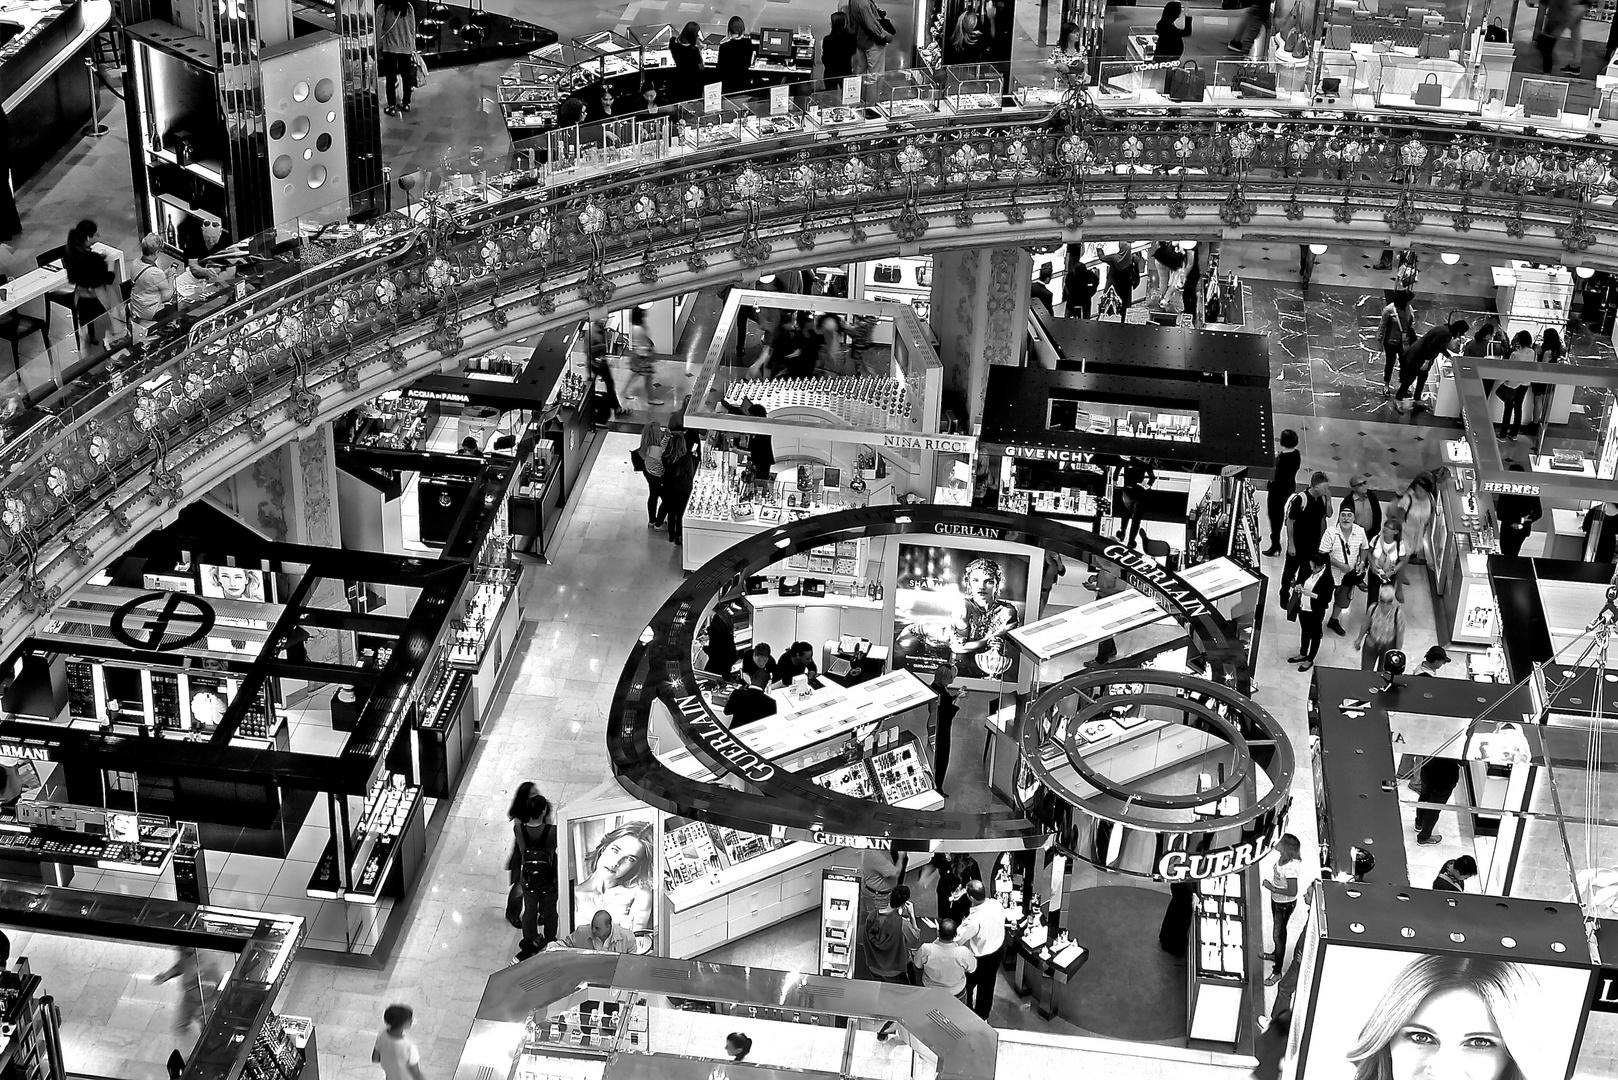 Shopping tu me manque.